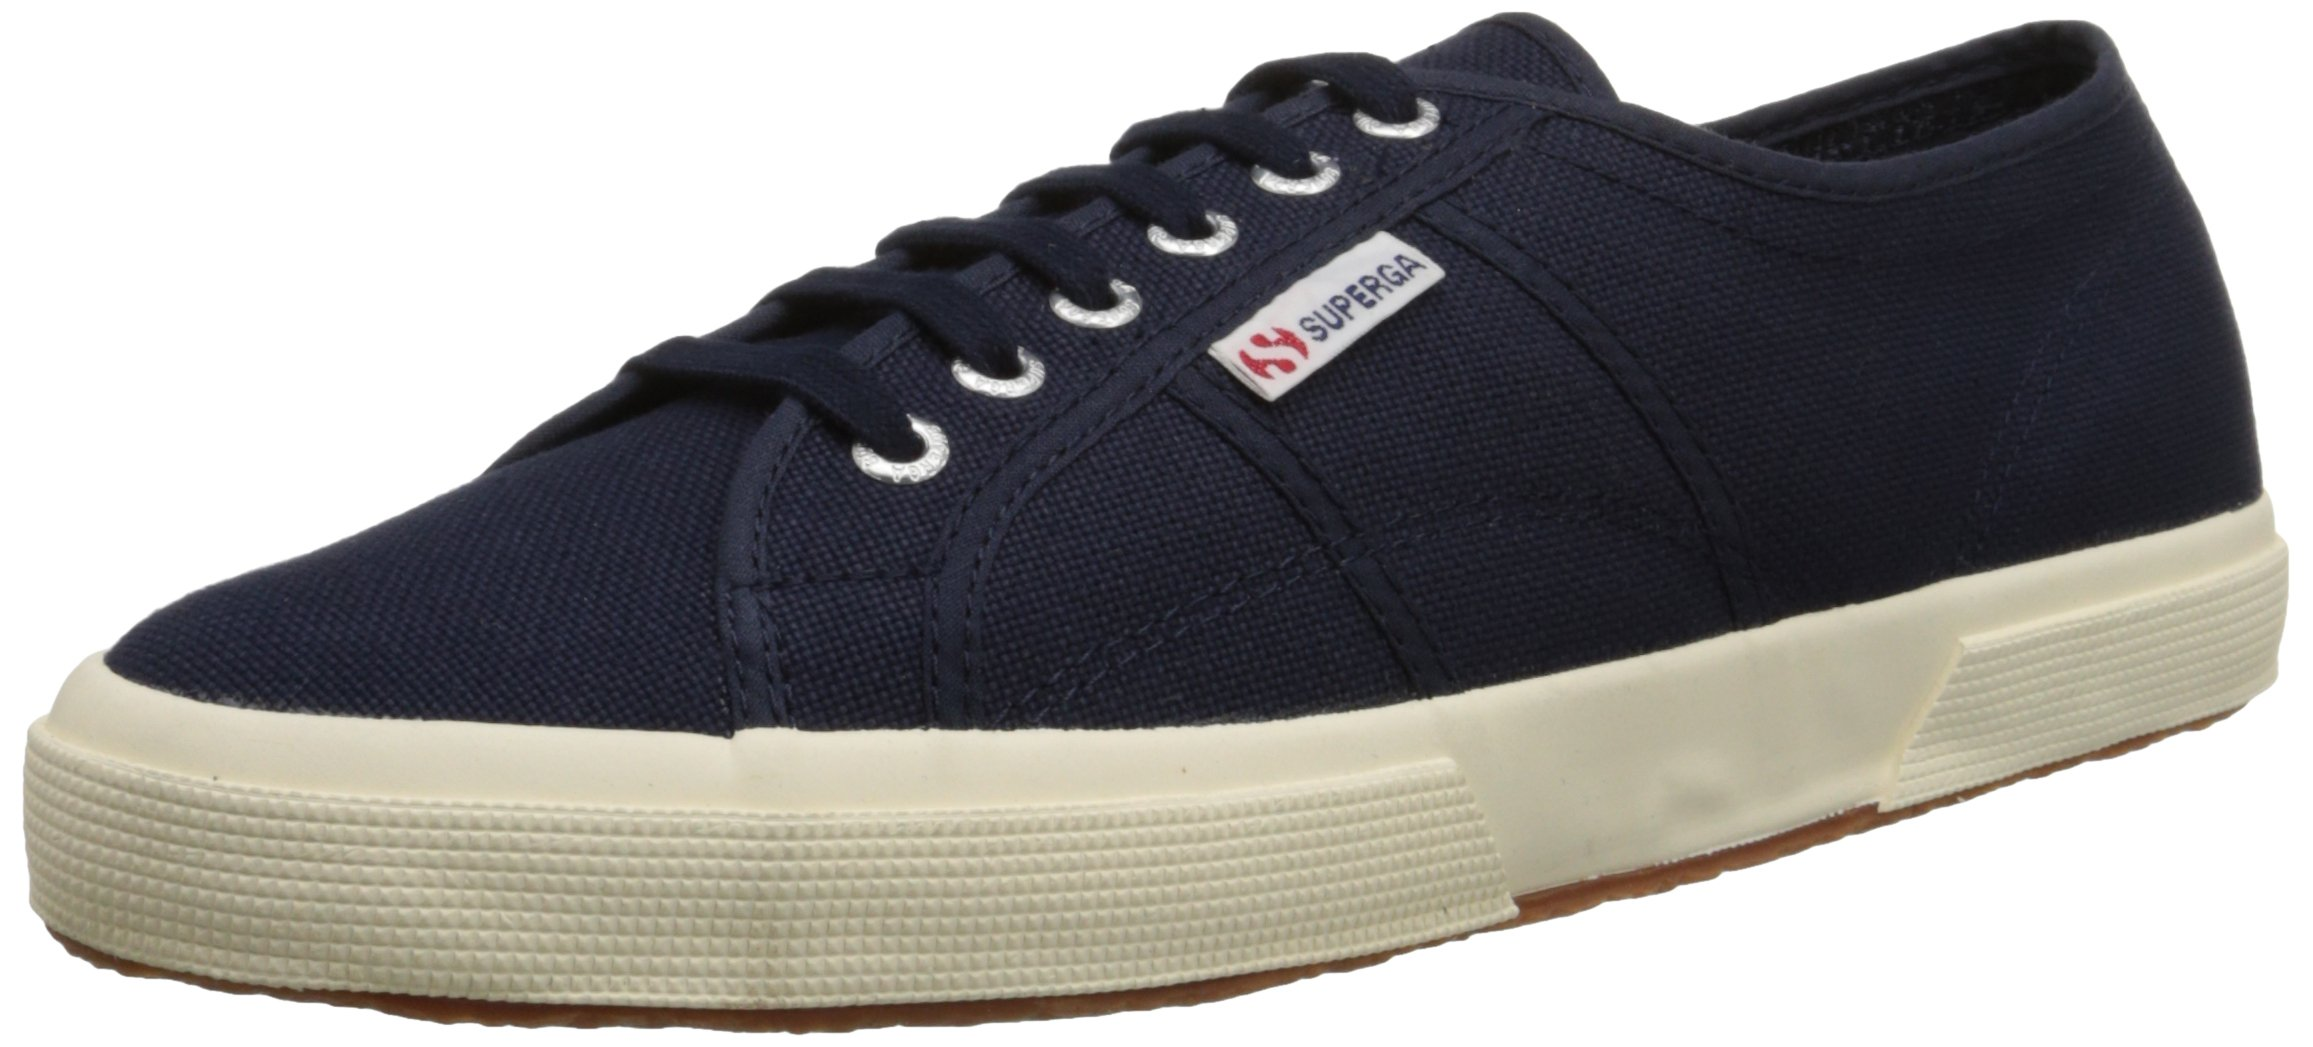 Superga Unisex 2750 Cotu  Navy Classic Sneaker - 36 M EU / 6 B(M) US Women / 4.5 D(M) US Men